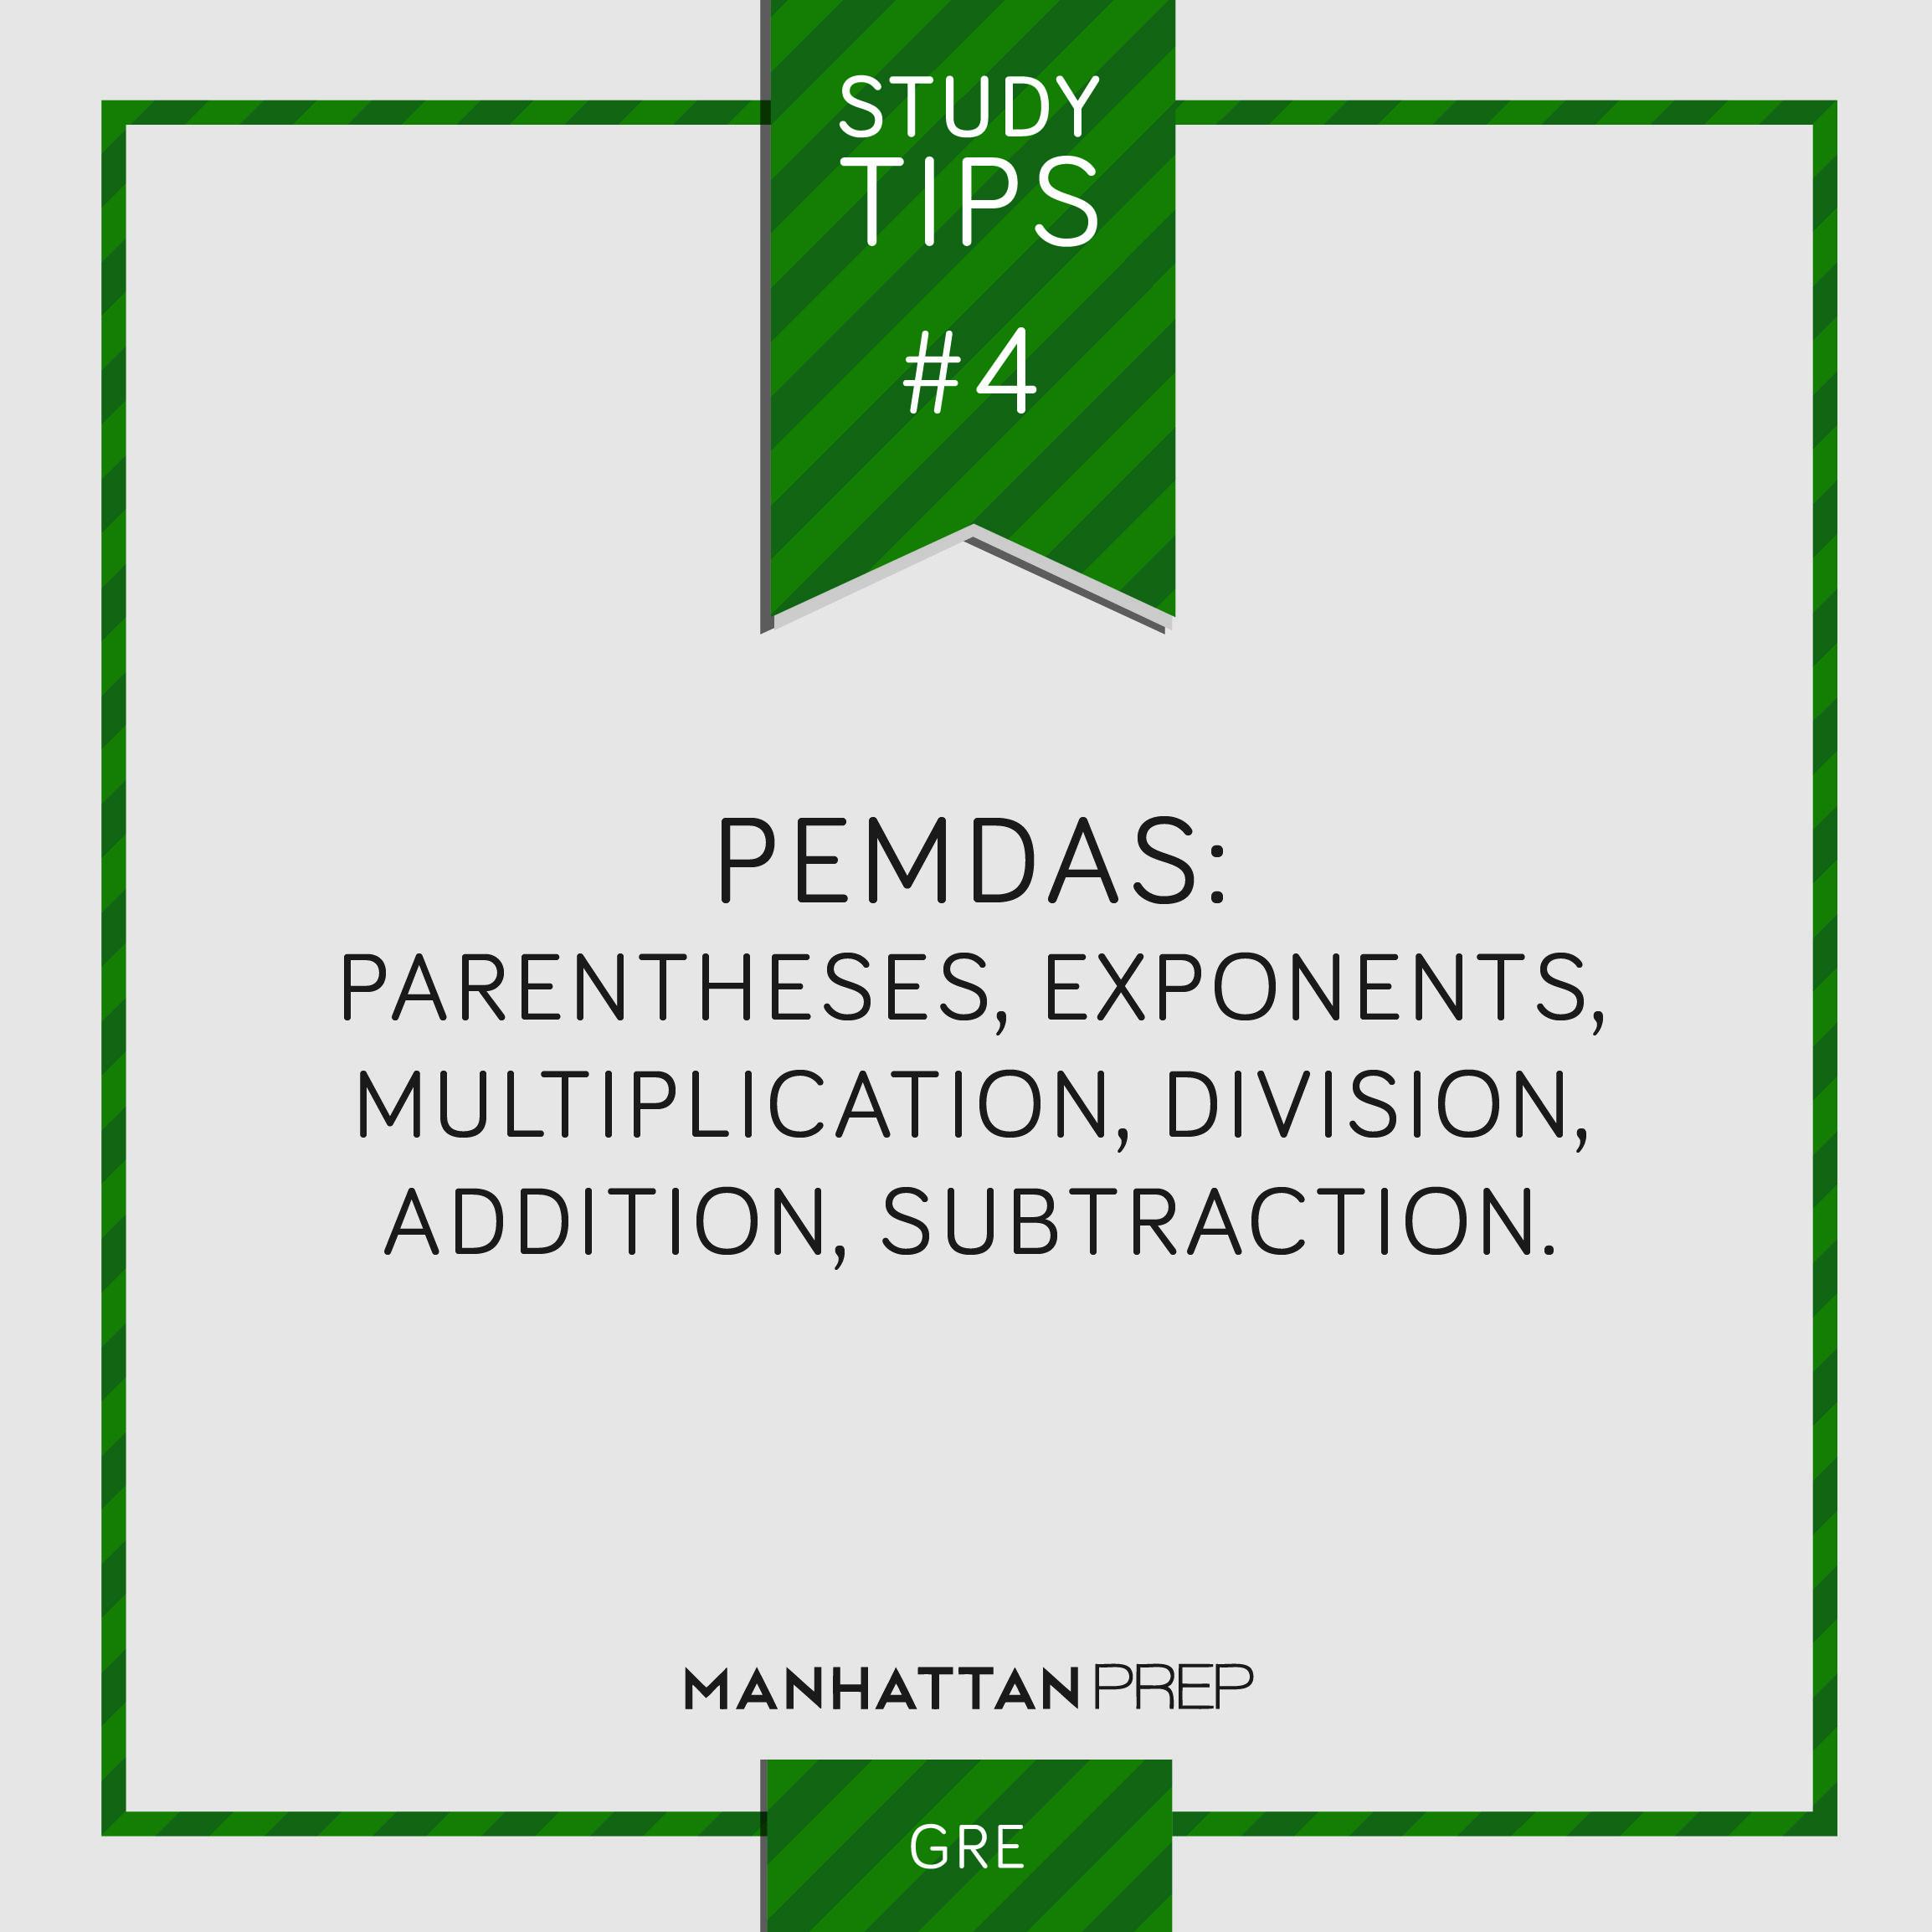 Studytips Gre